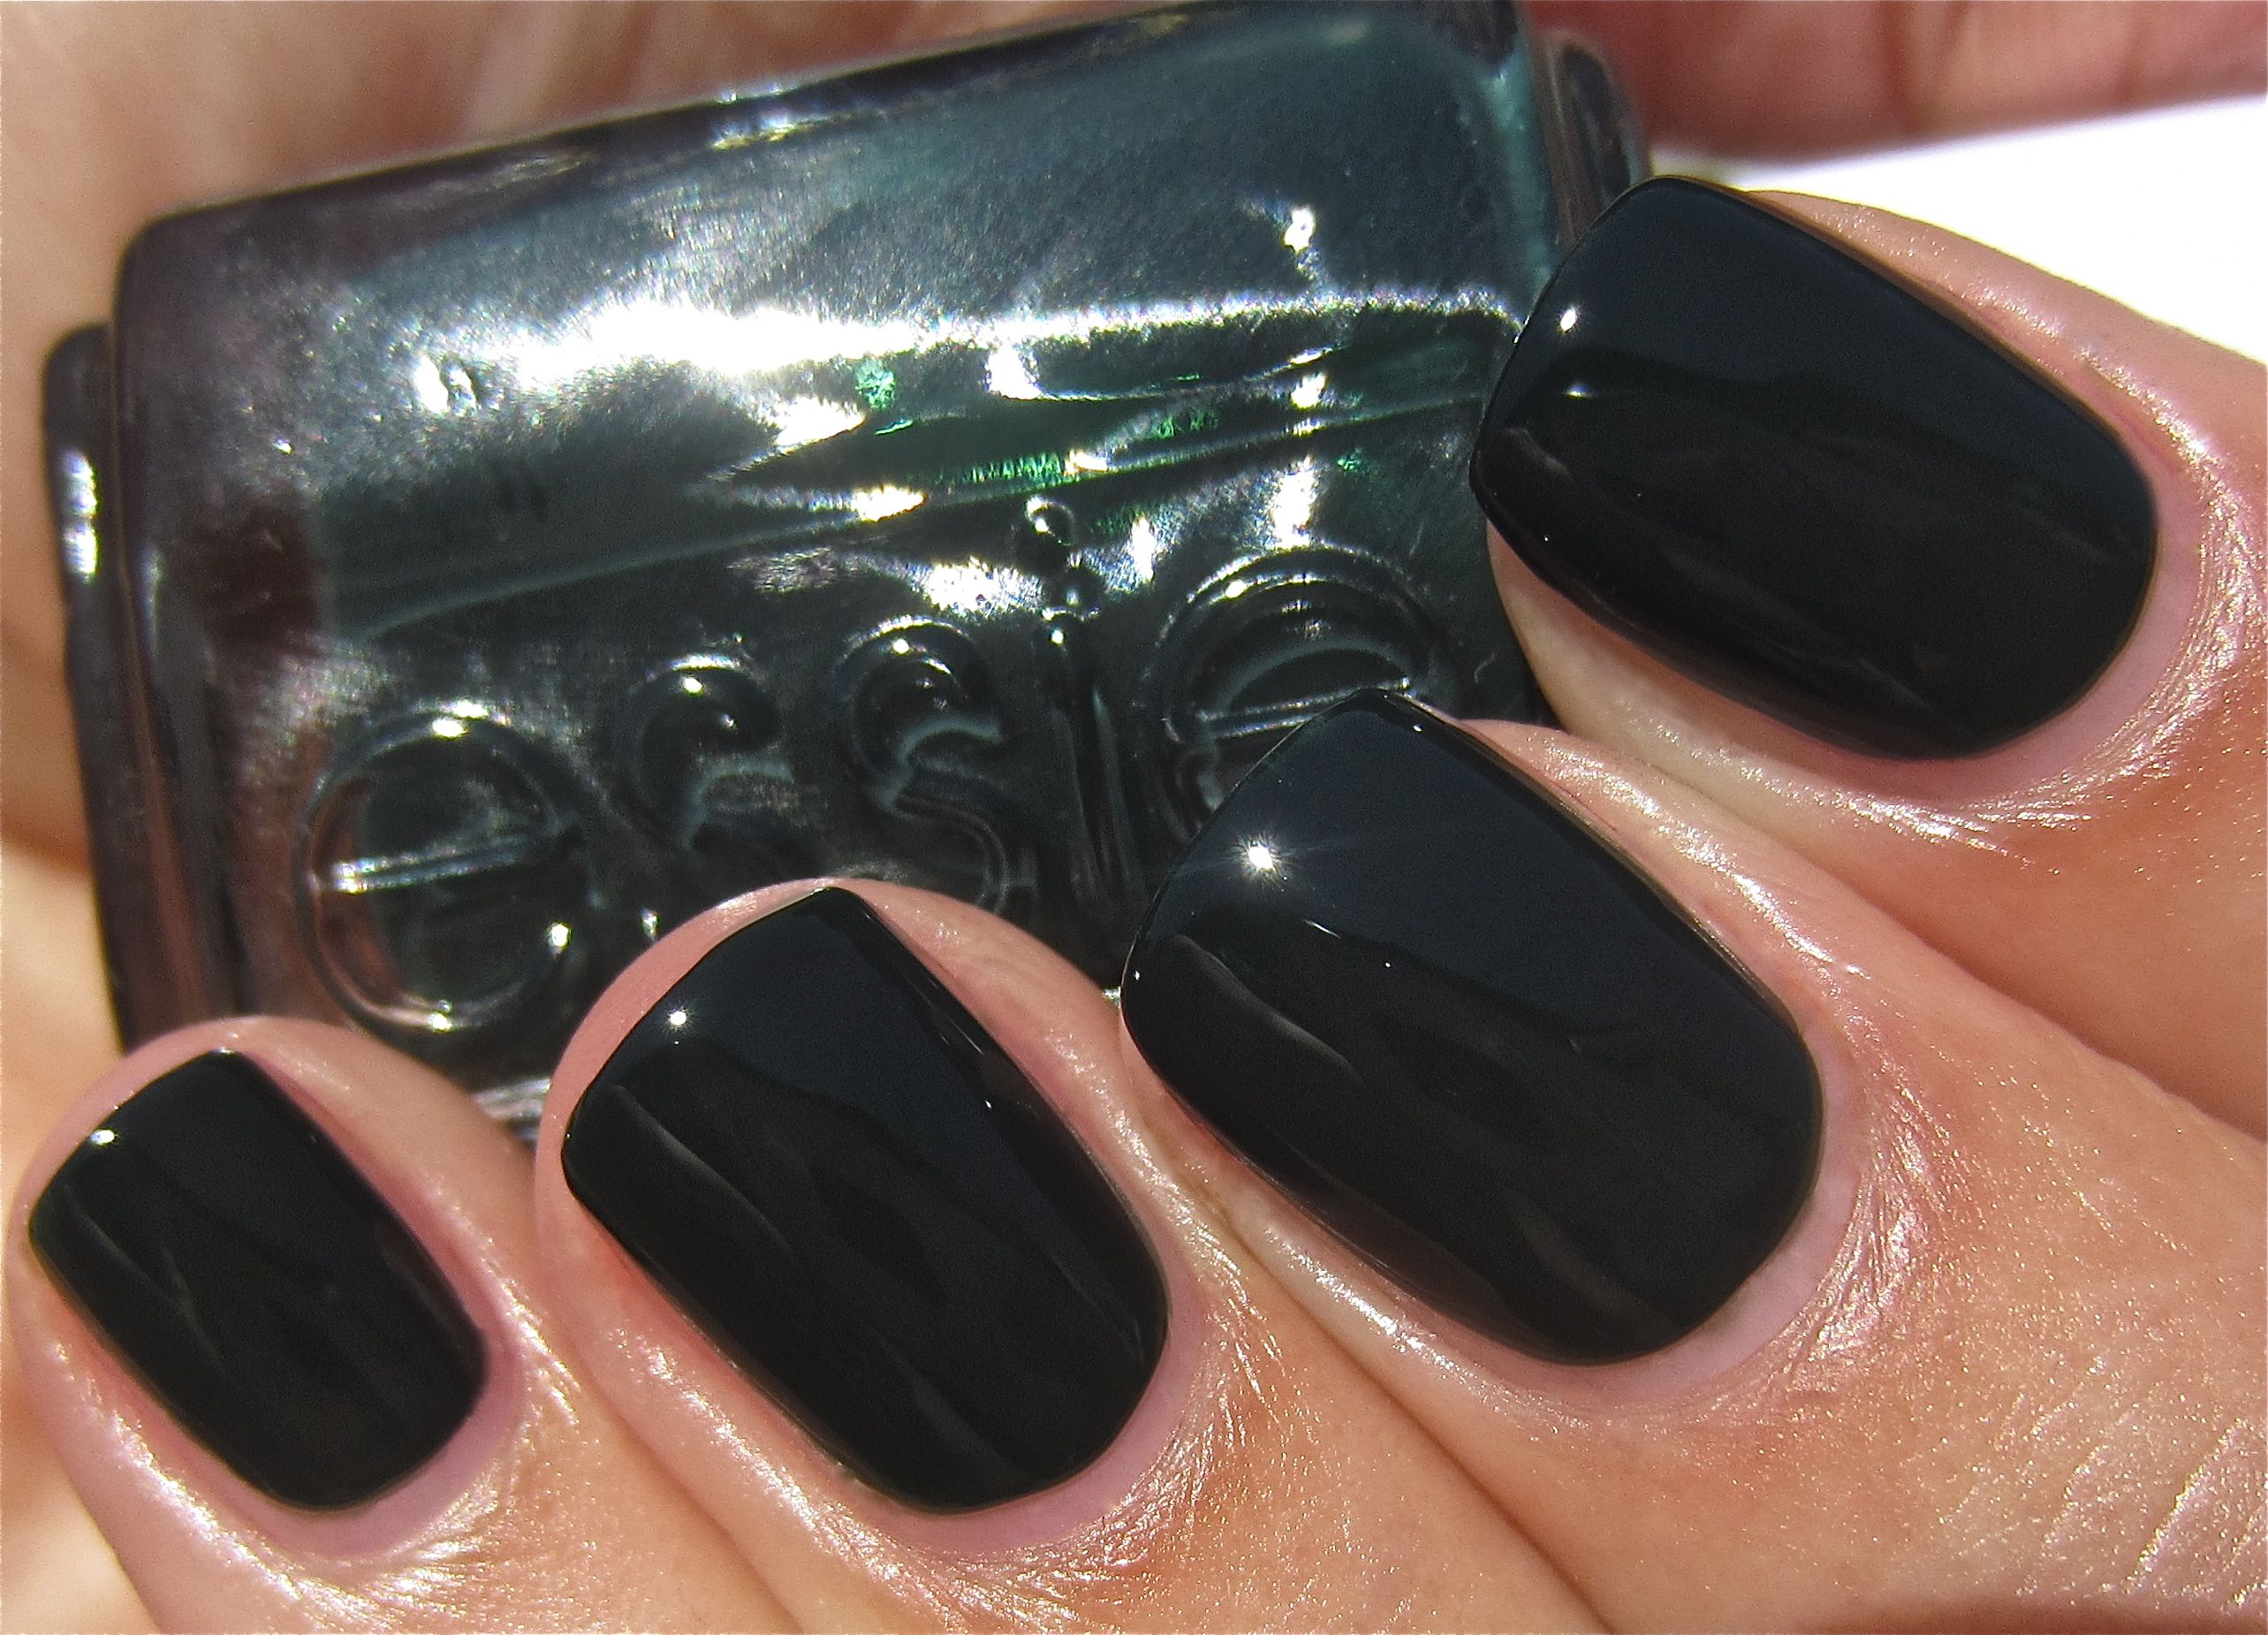 essie - Stylenomics | Nails: Polish Colors | Pinterest | Nail stuff ...